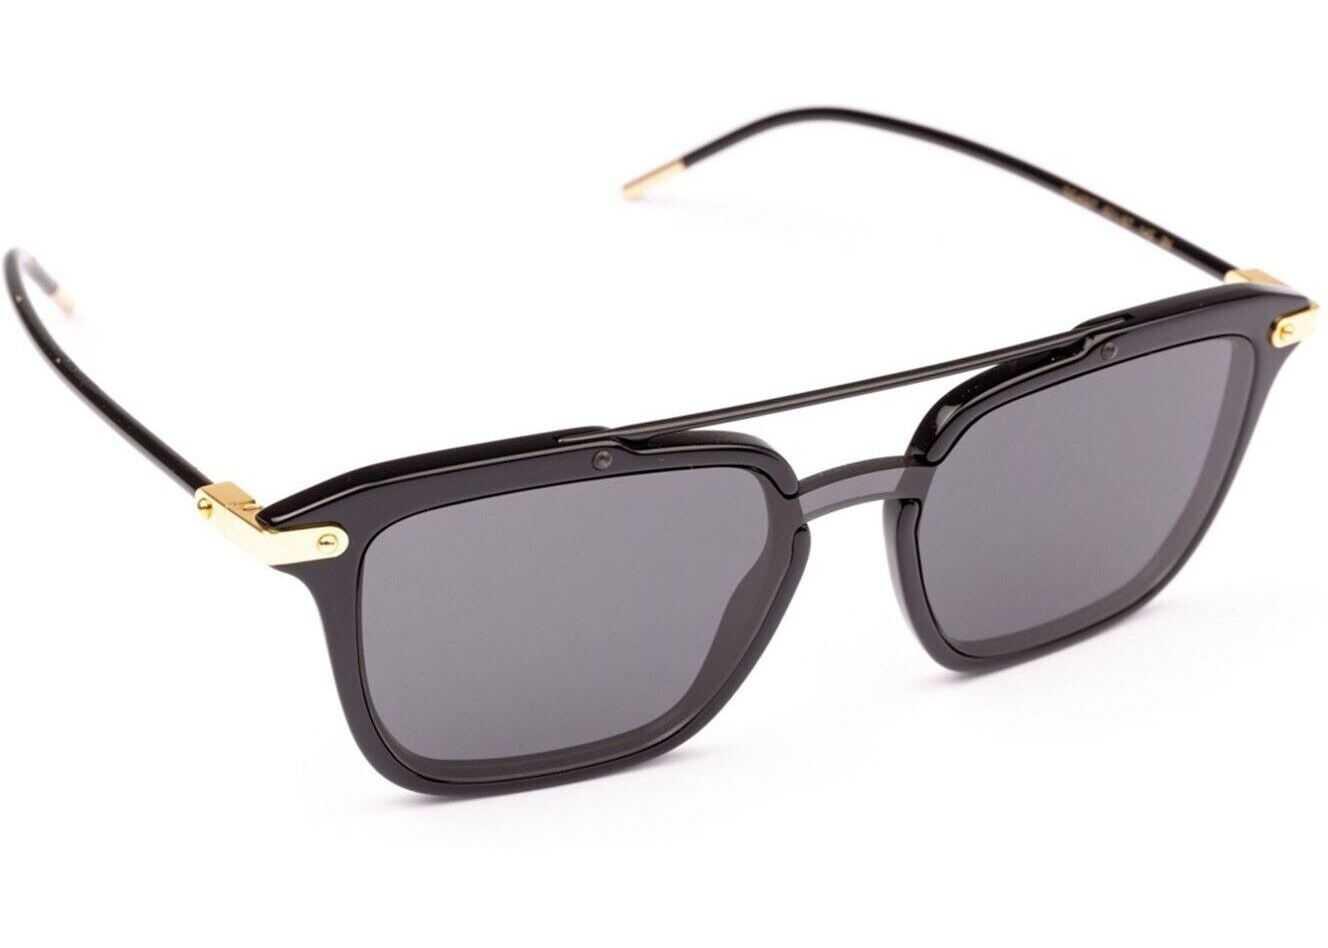 Dolce & Gabbana Double Bridge Black Square Sunglasses* Black